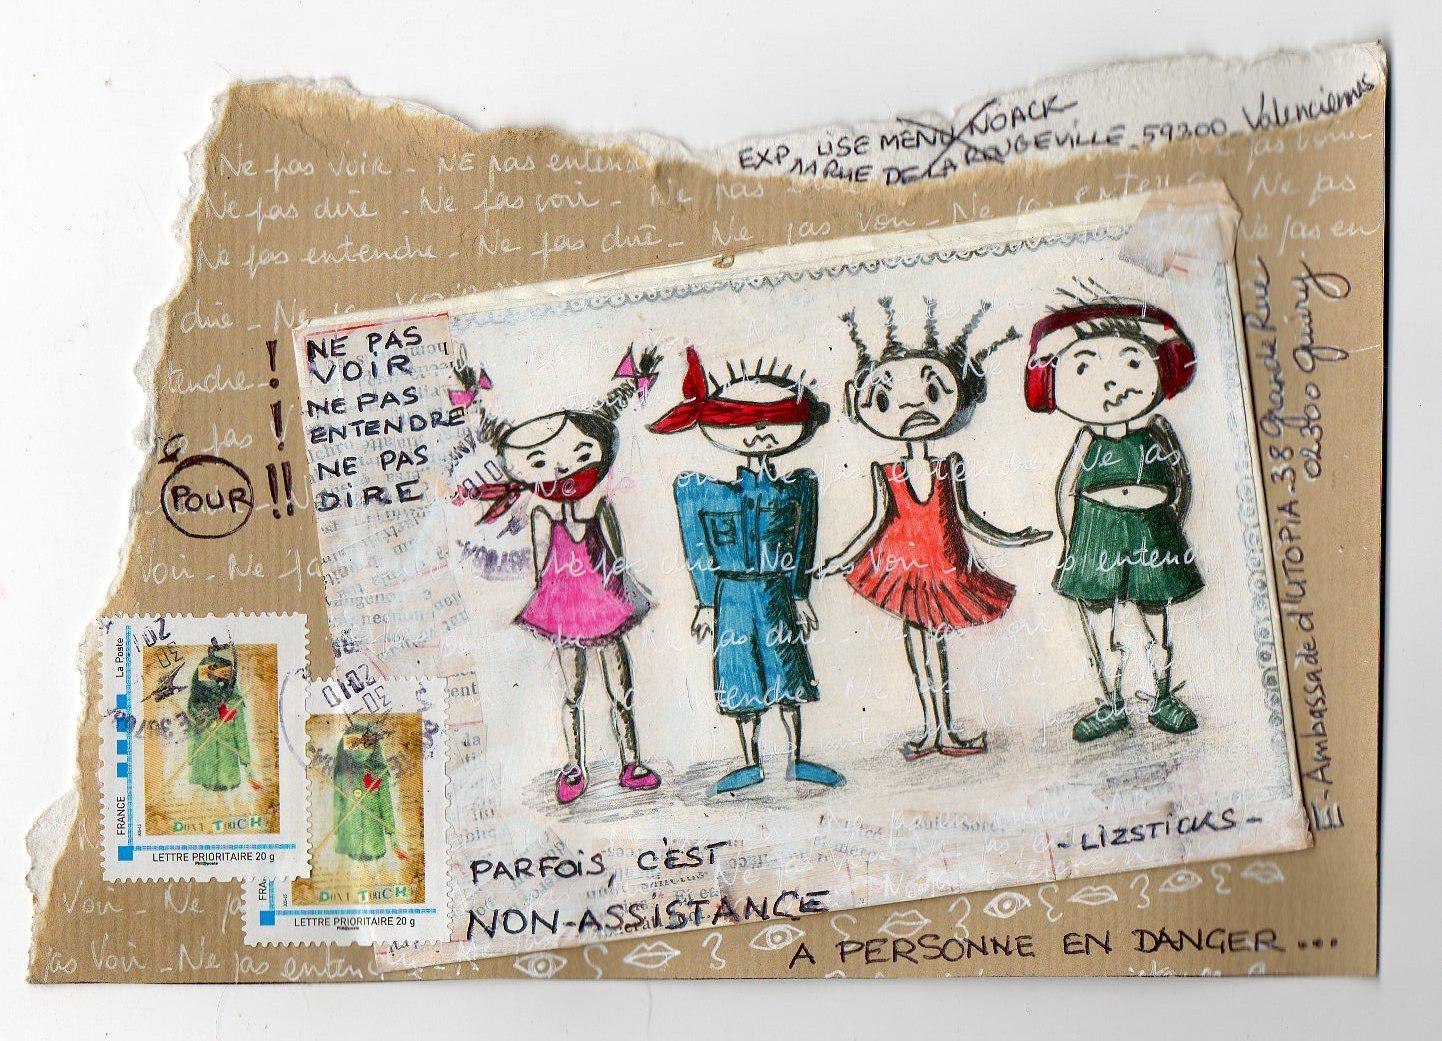 Erotic-cartoon net valenciennes